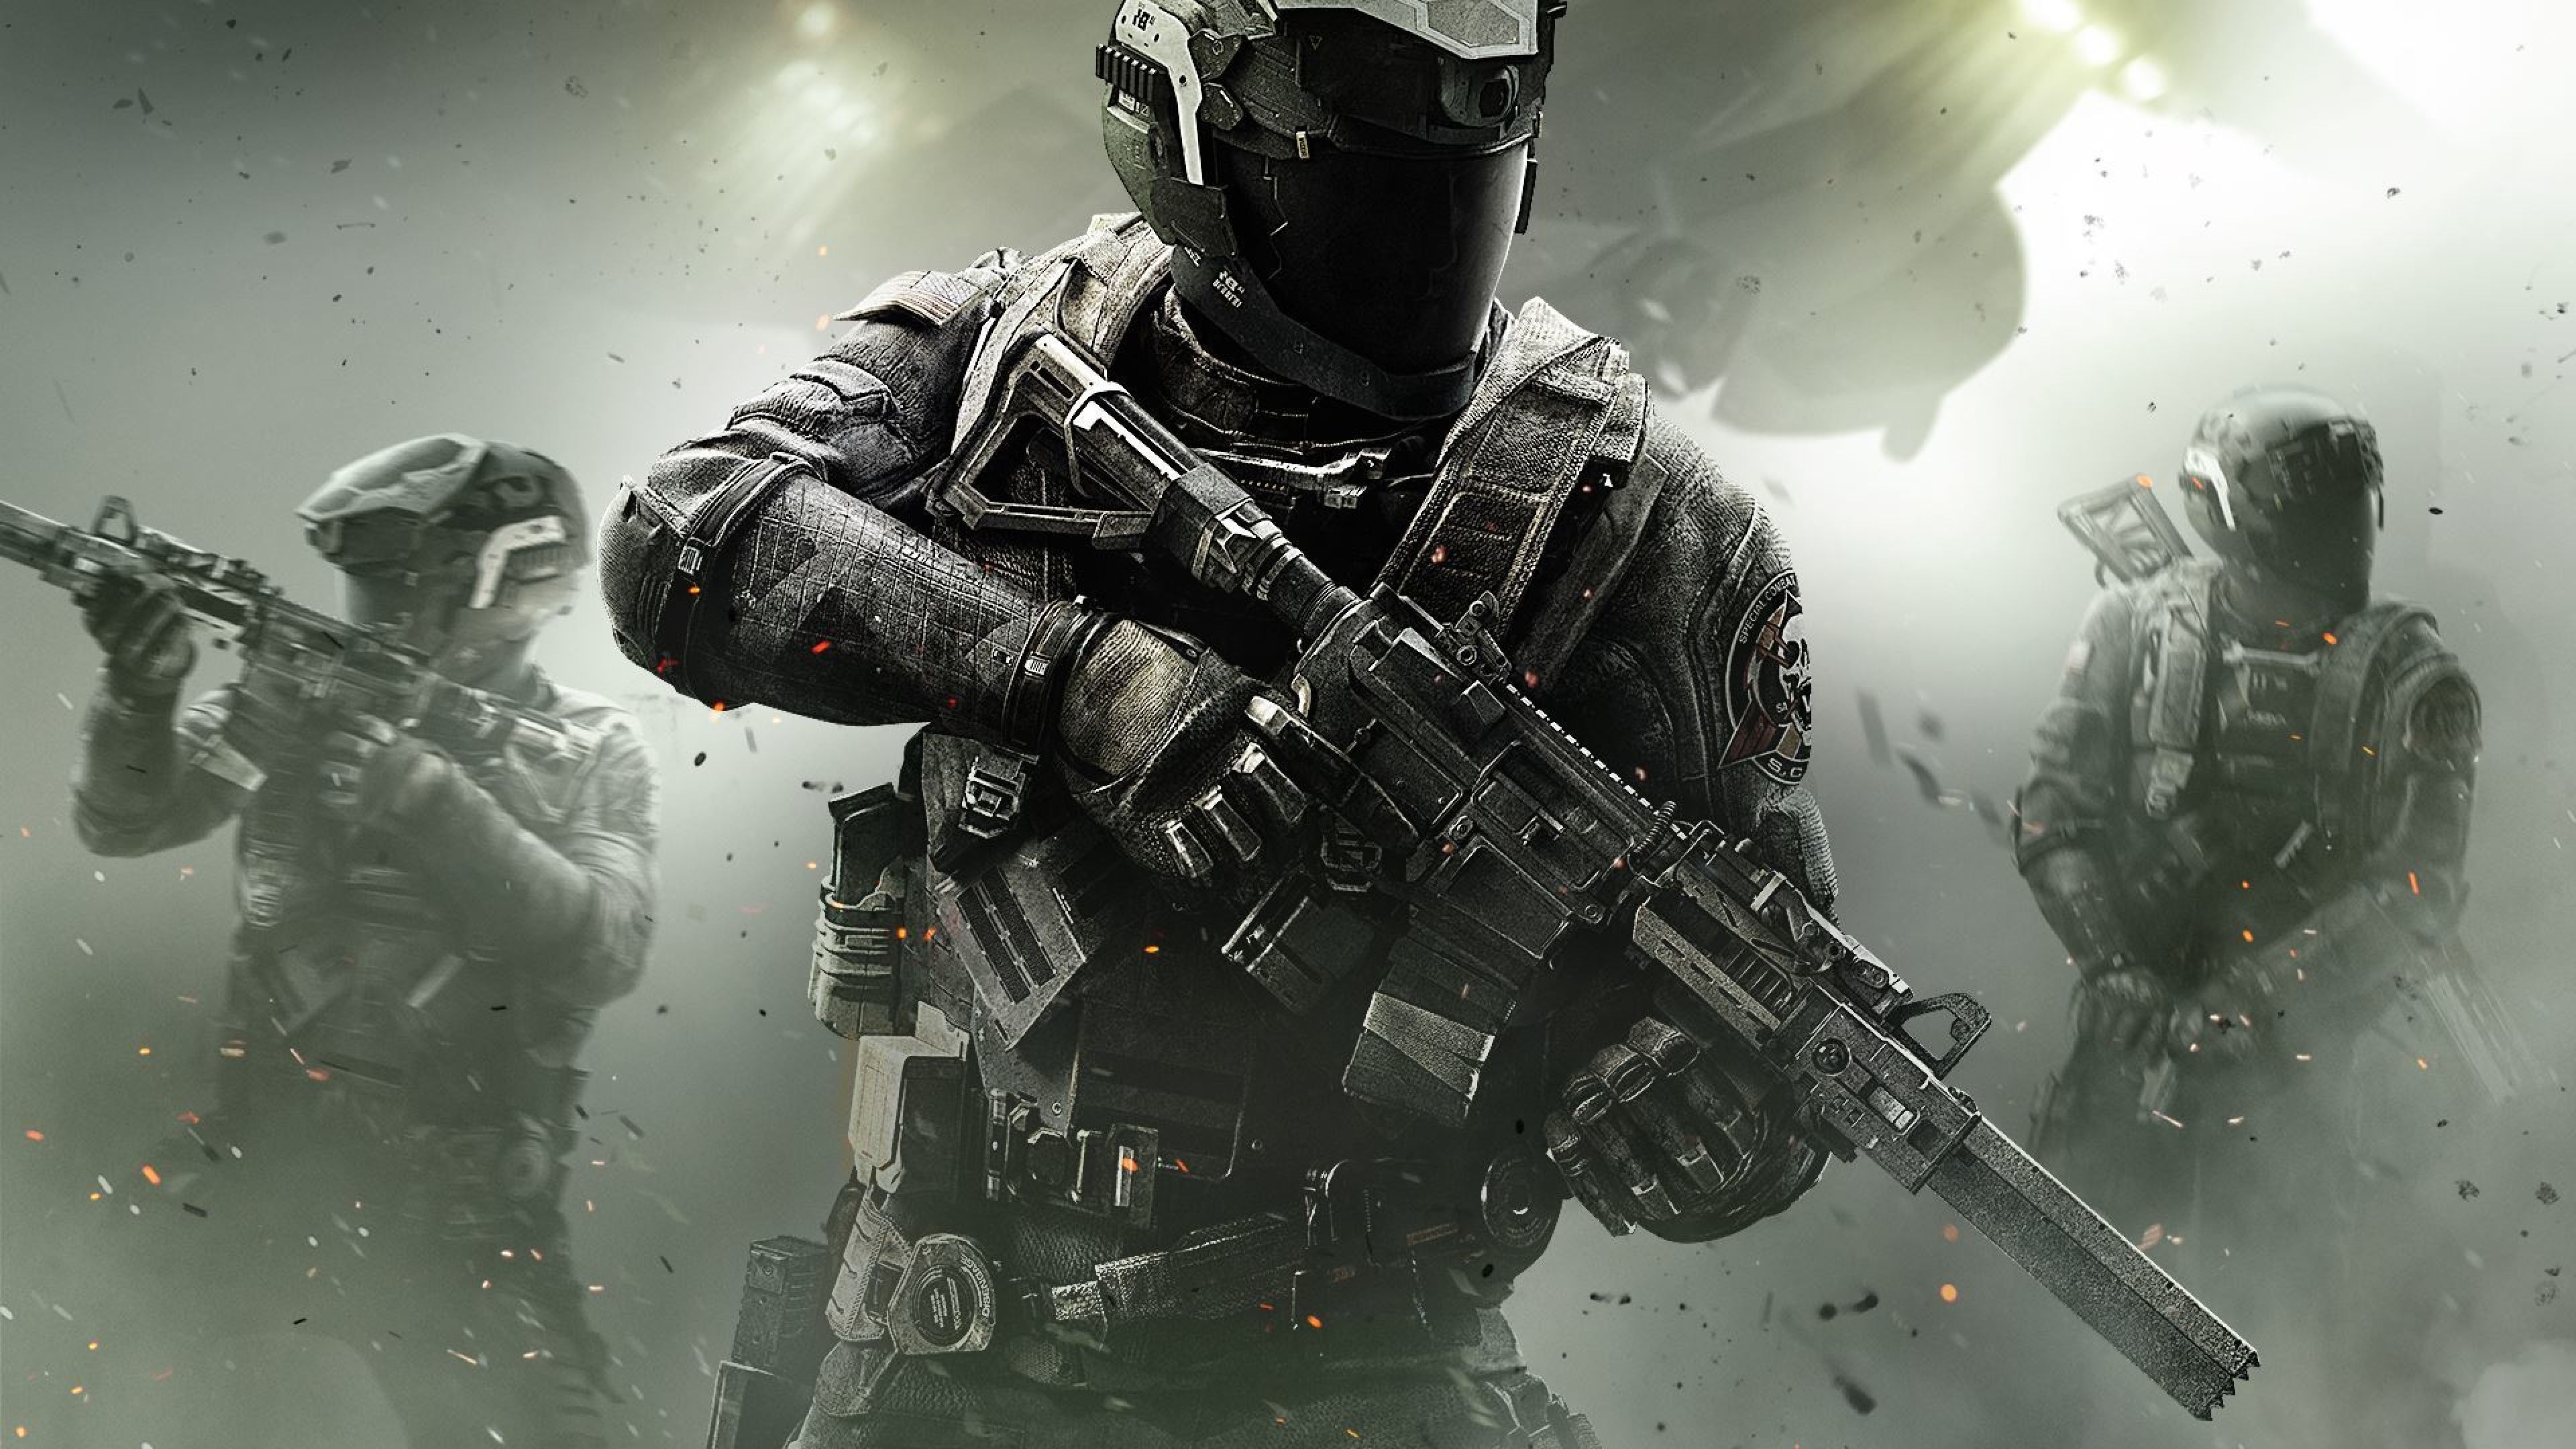 Download Wallpaper 3840x2160 Call of duty, Infinite